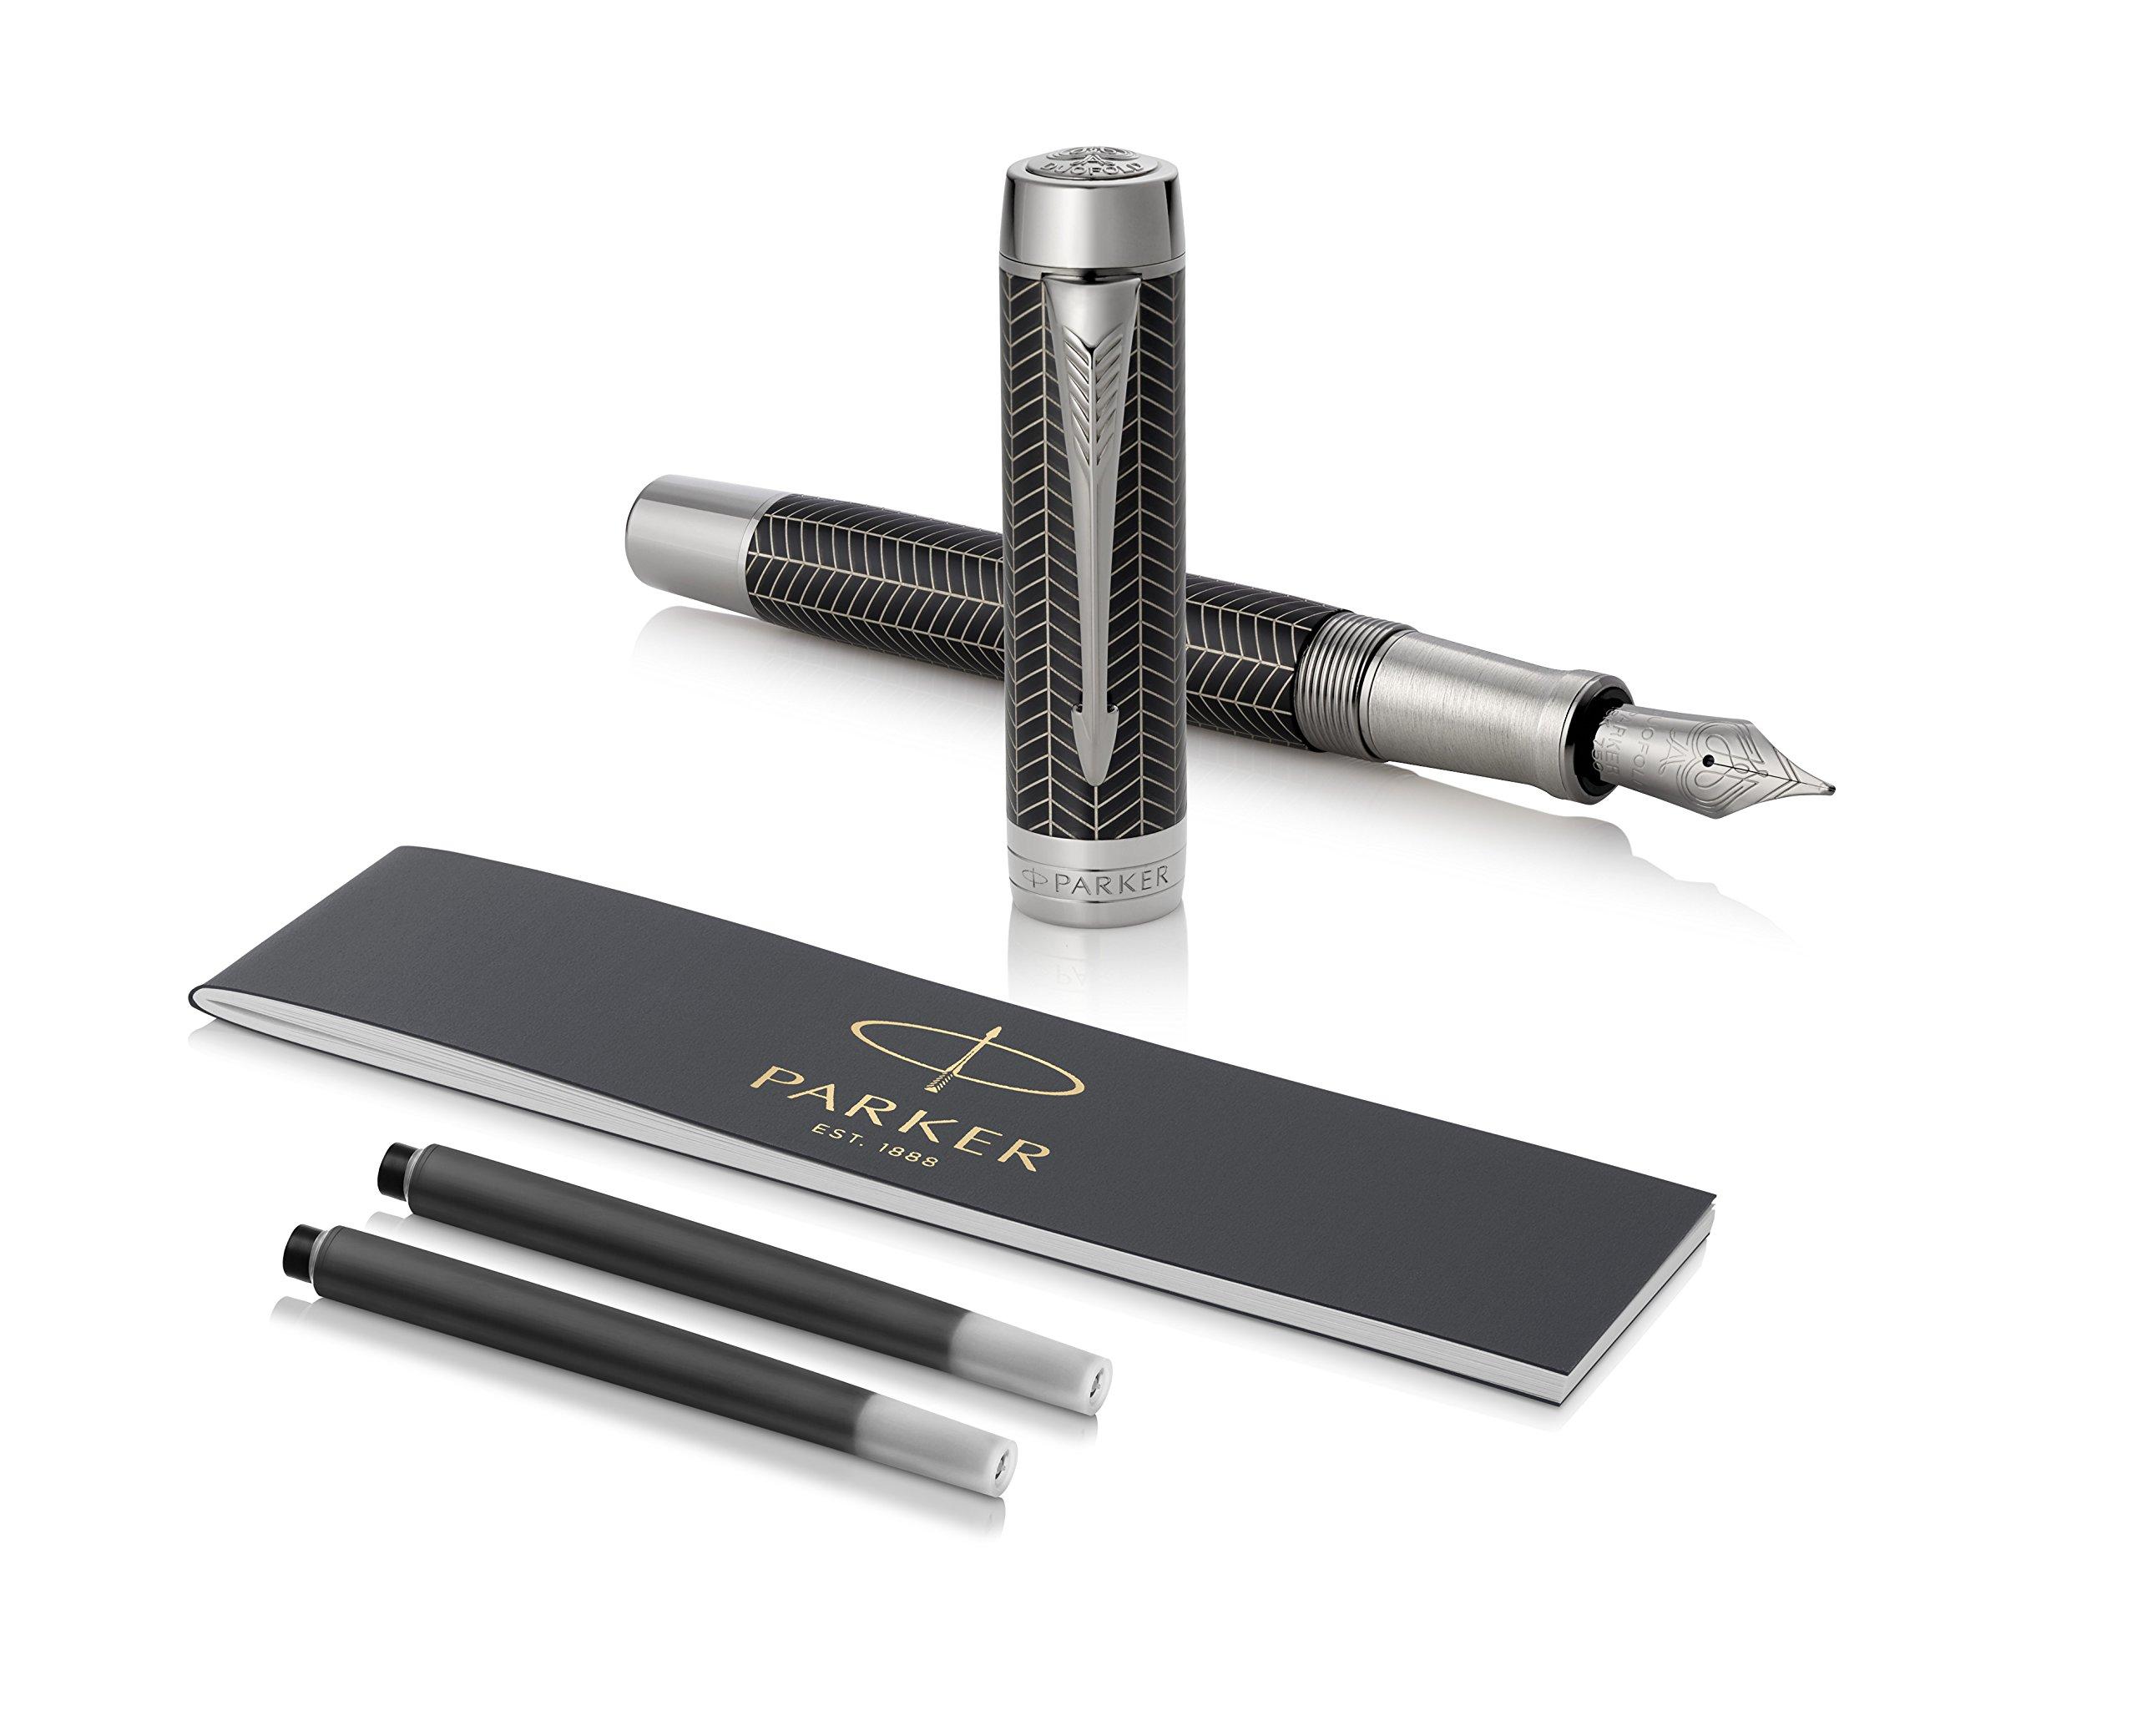 PARKER Duofold Centennial Fountain Pen, Prestige Black Chevron, Fine Solid Gold Nib, Black Ink and Convertor (1945413)